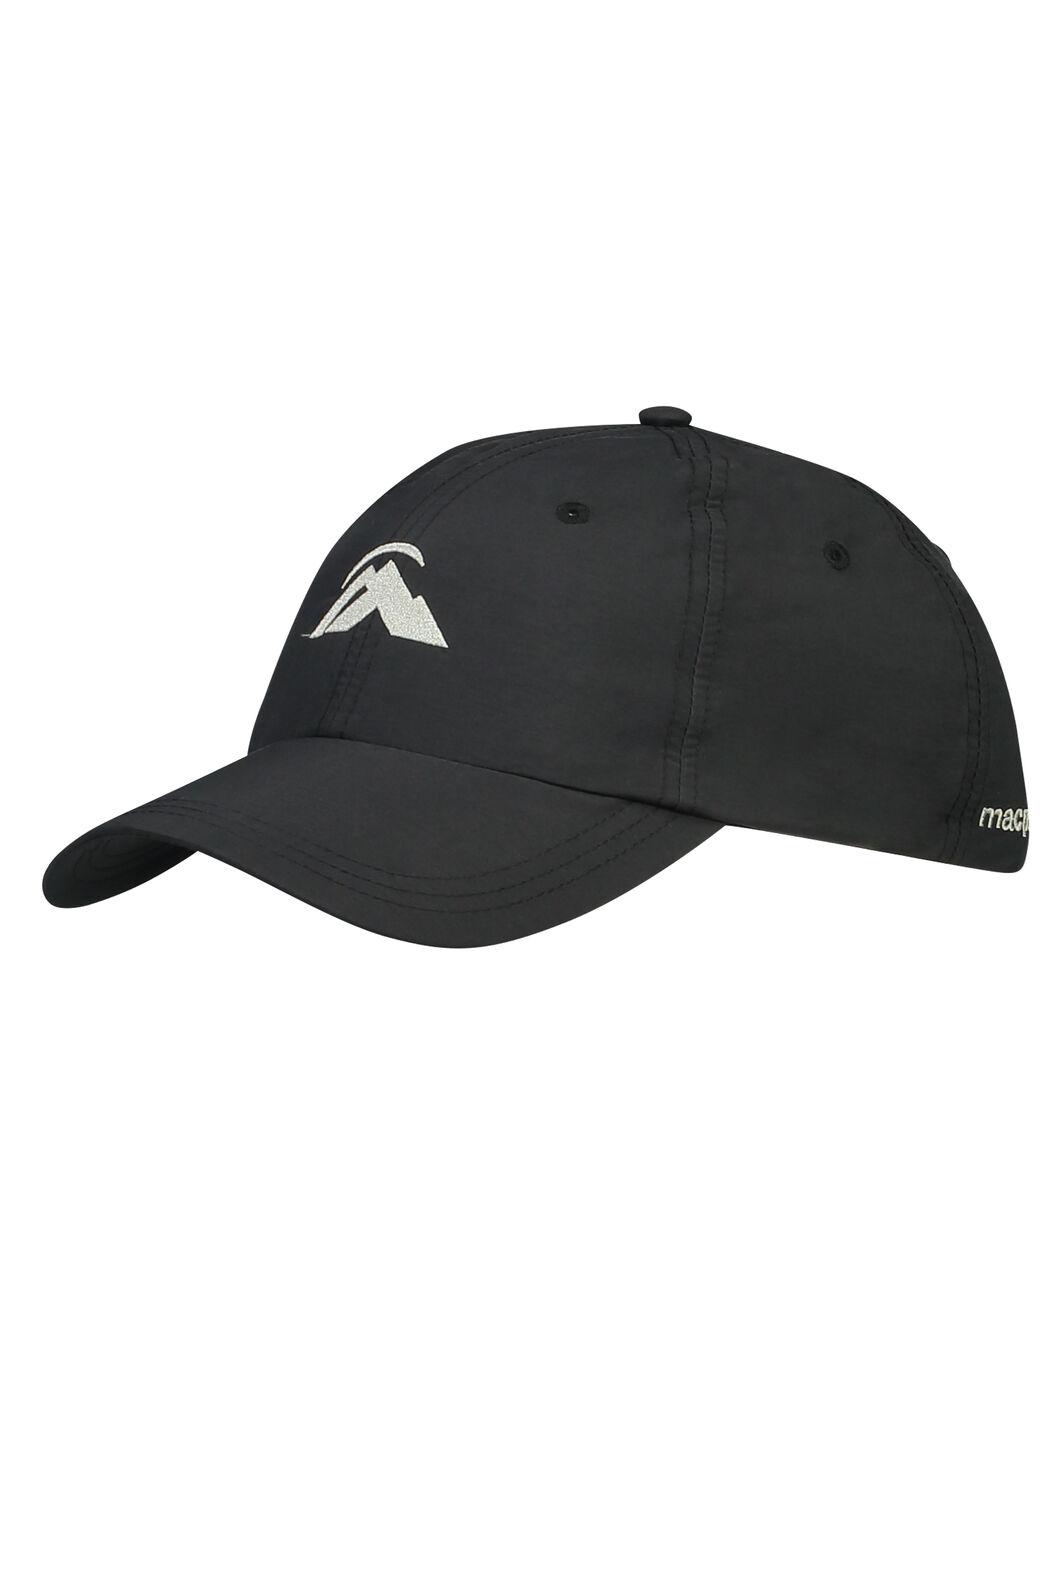 Macpac Hiker Cap, Black, hi-res